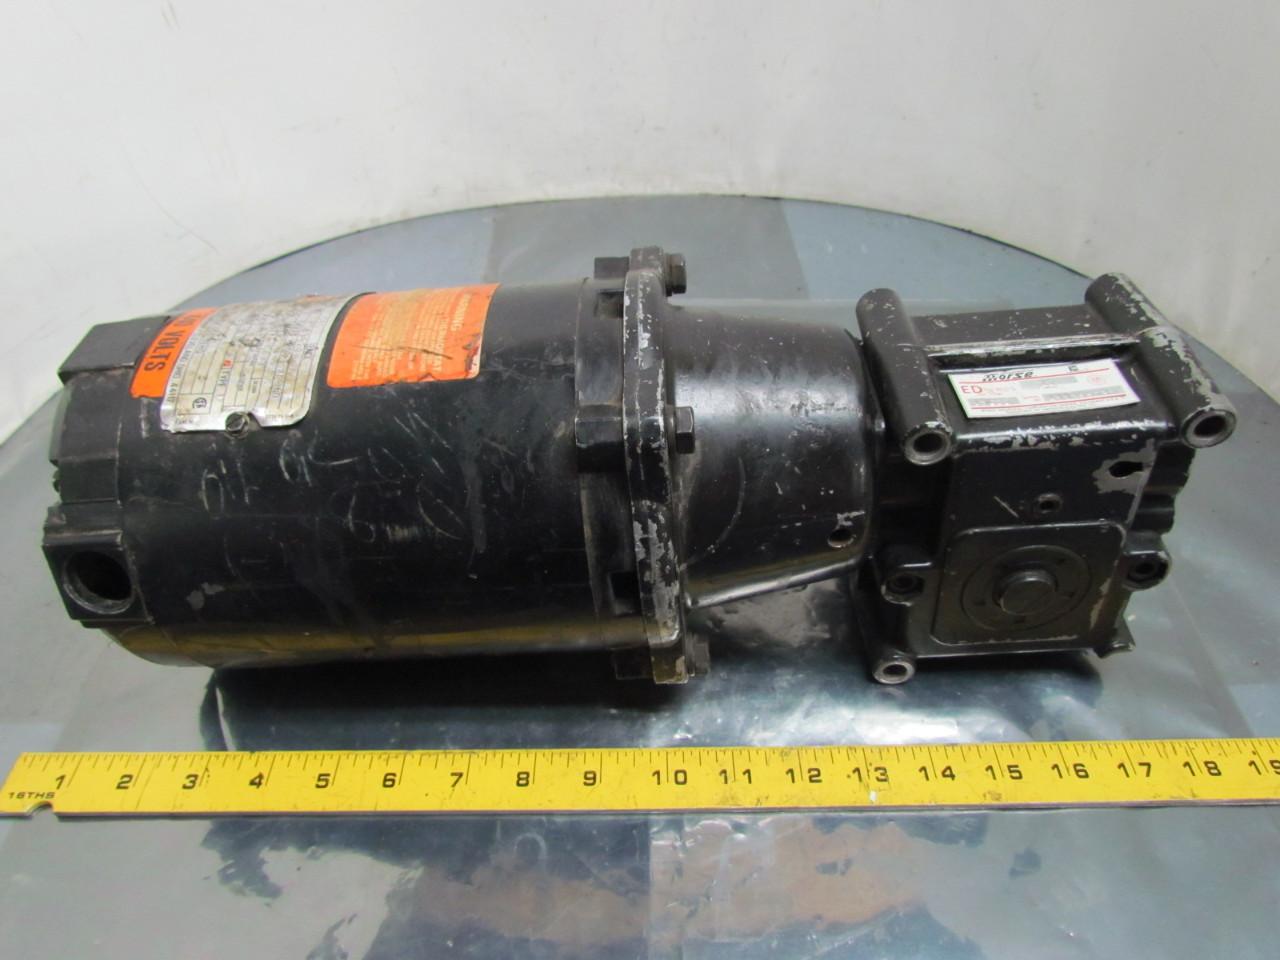 Reliance Electric 1 4 Hp 3ph 56c Motor W Morse 15ged 10 1